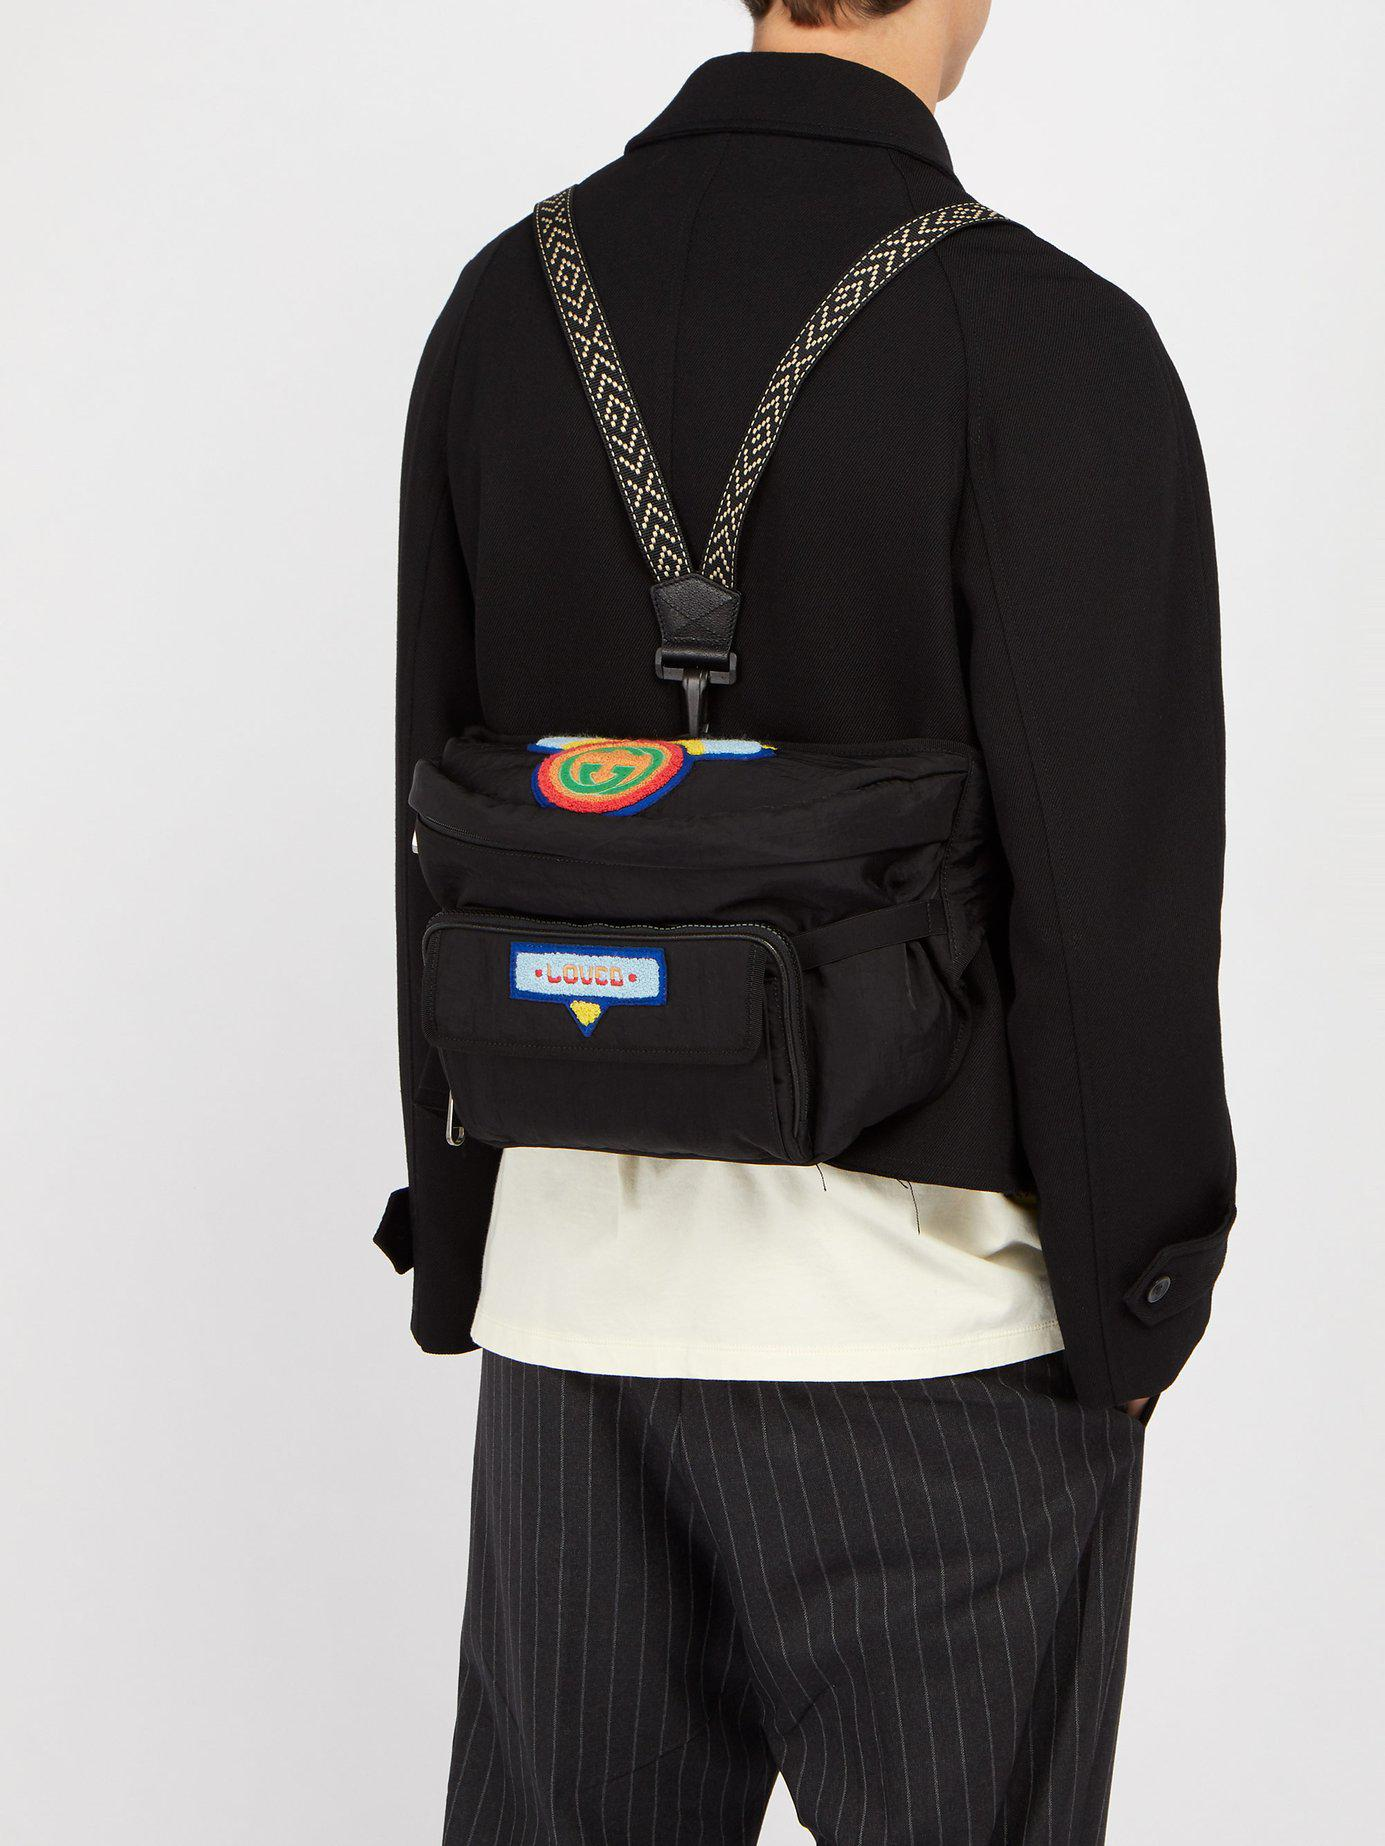 a1e27cdc0 Gucci - Black Loved Chenille Appliquéd Belt Bag for Men - Lyst. View  fullscreen